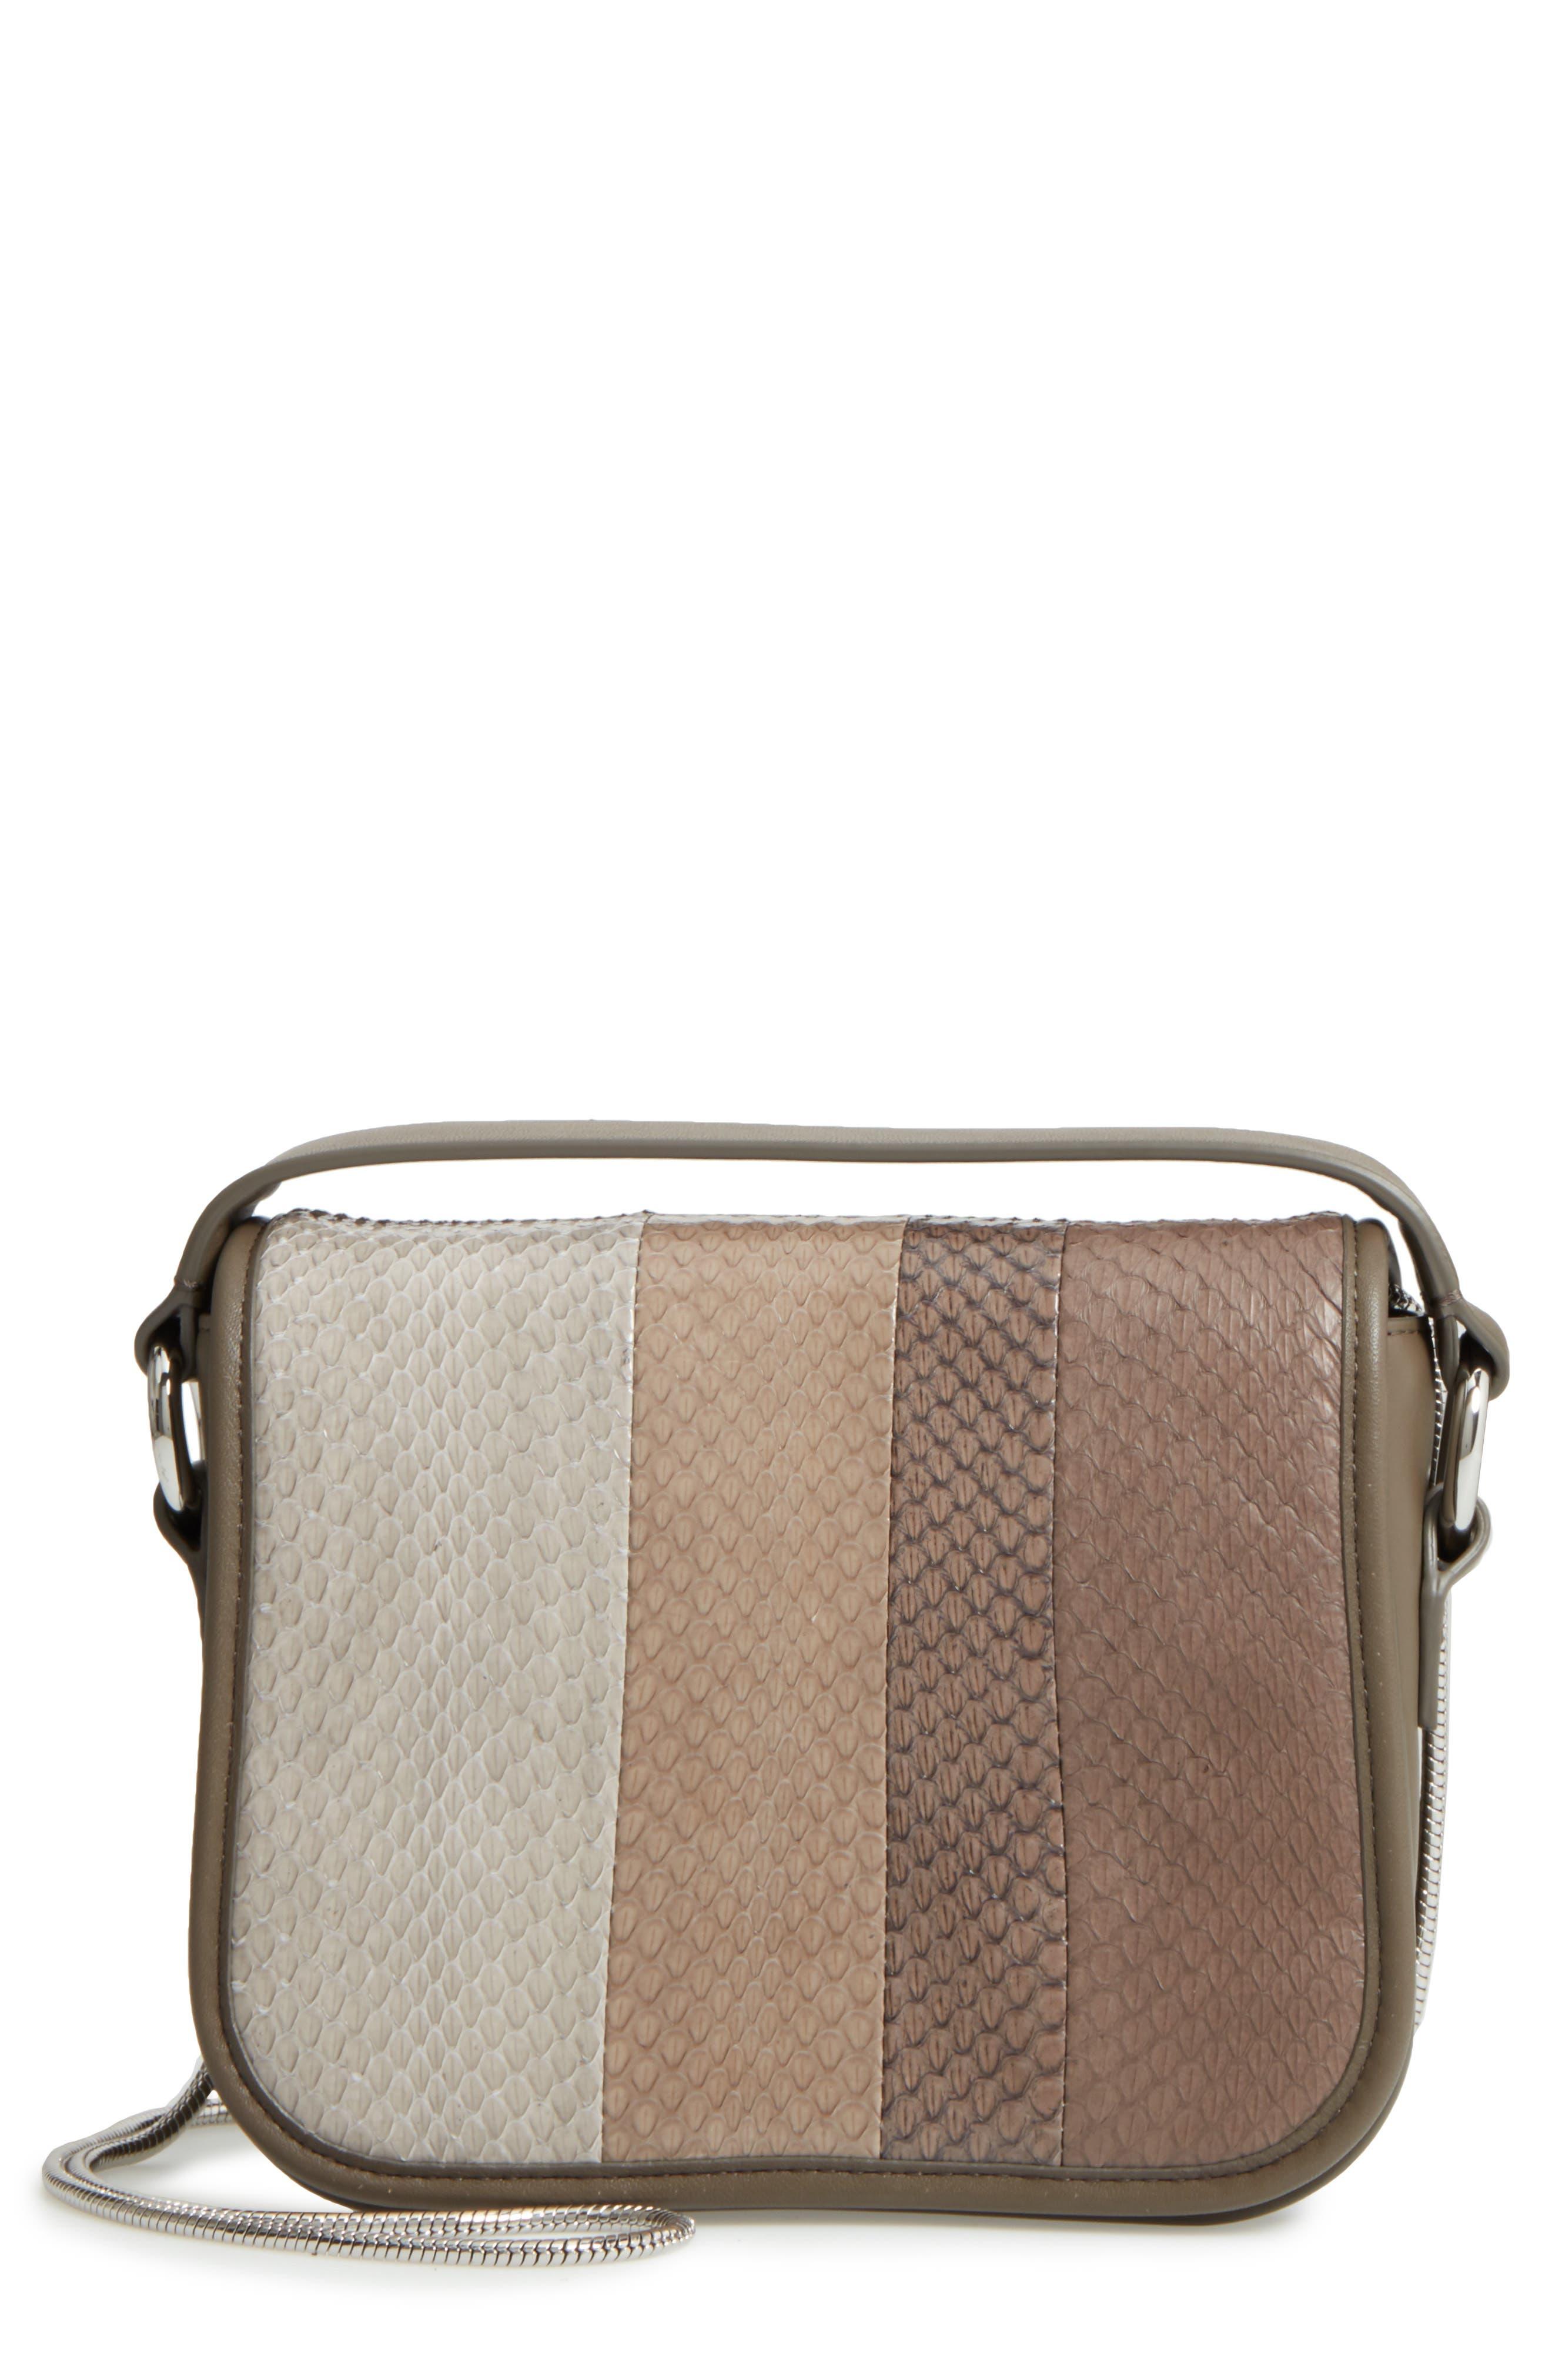 Alternate Image 1 Selected - ALLSAINTS Ikuya Leather & Genuine Snakeskin Clutch